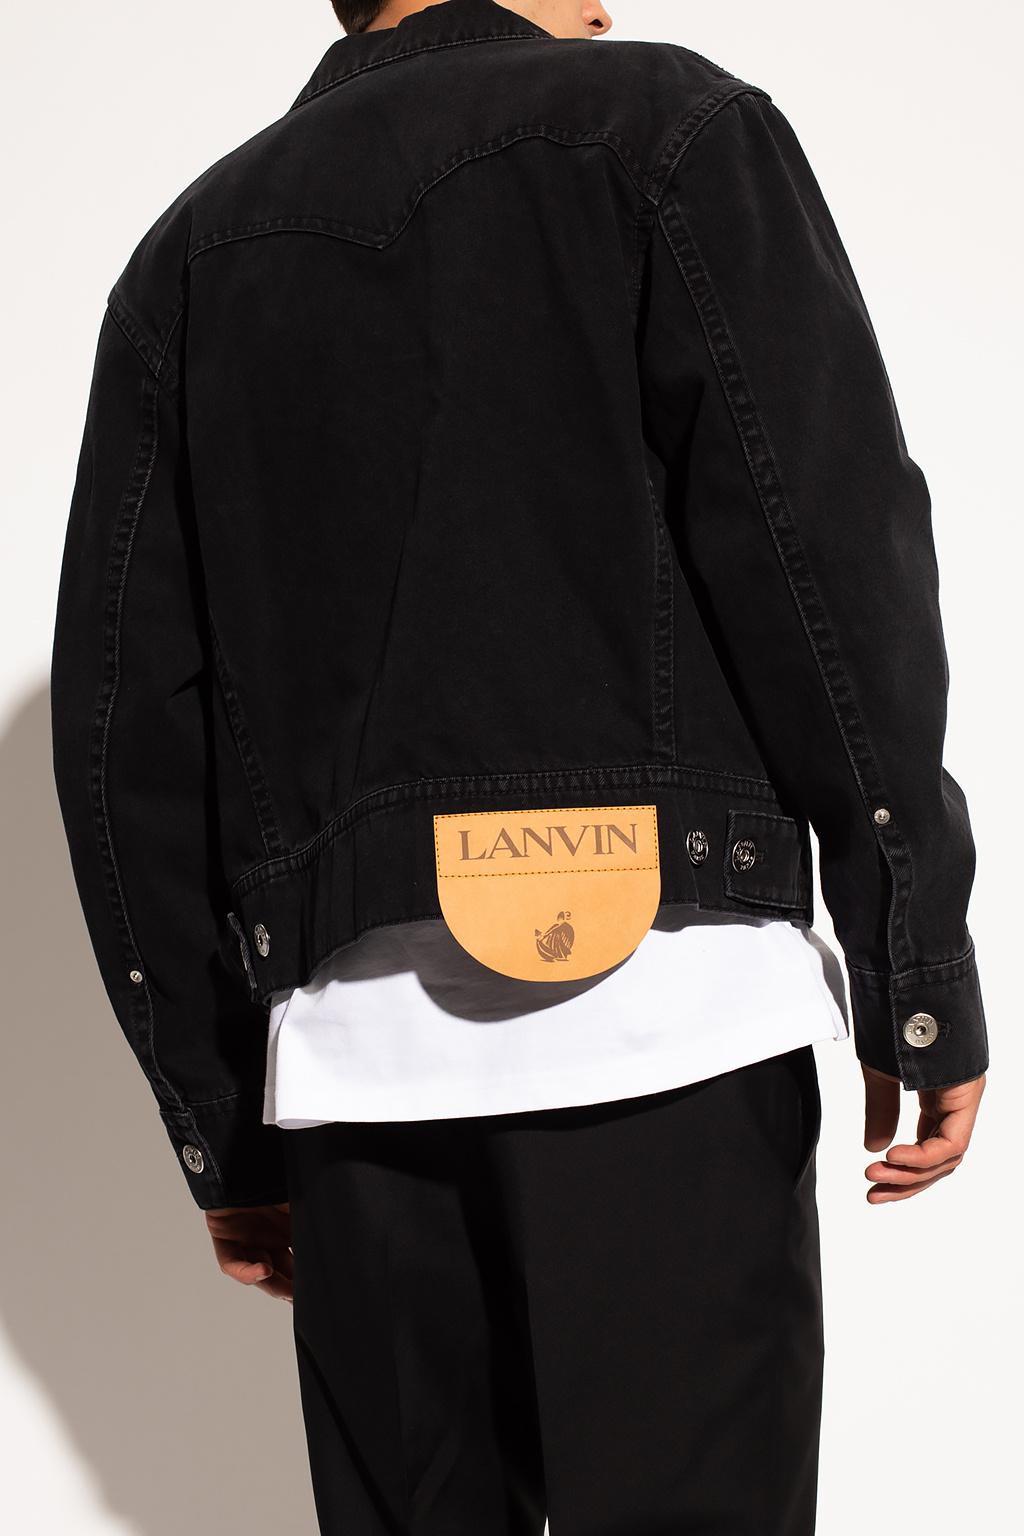 Lanvin Denim jacket with logo